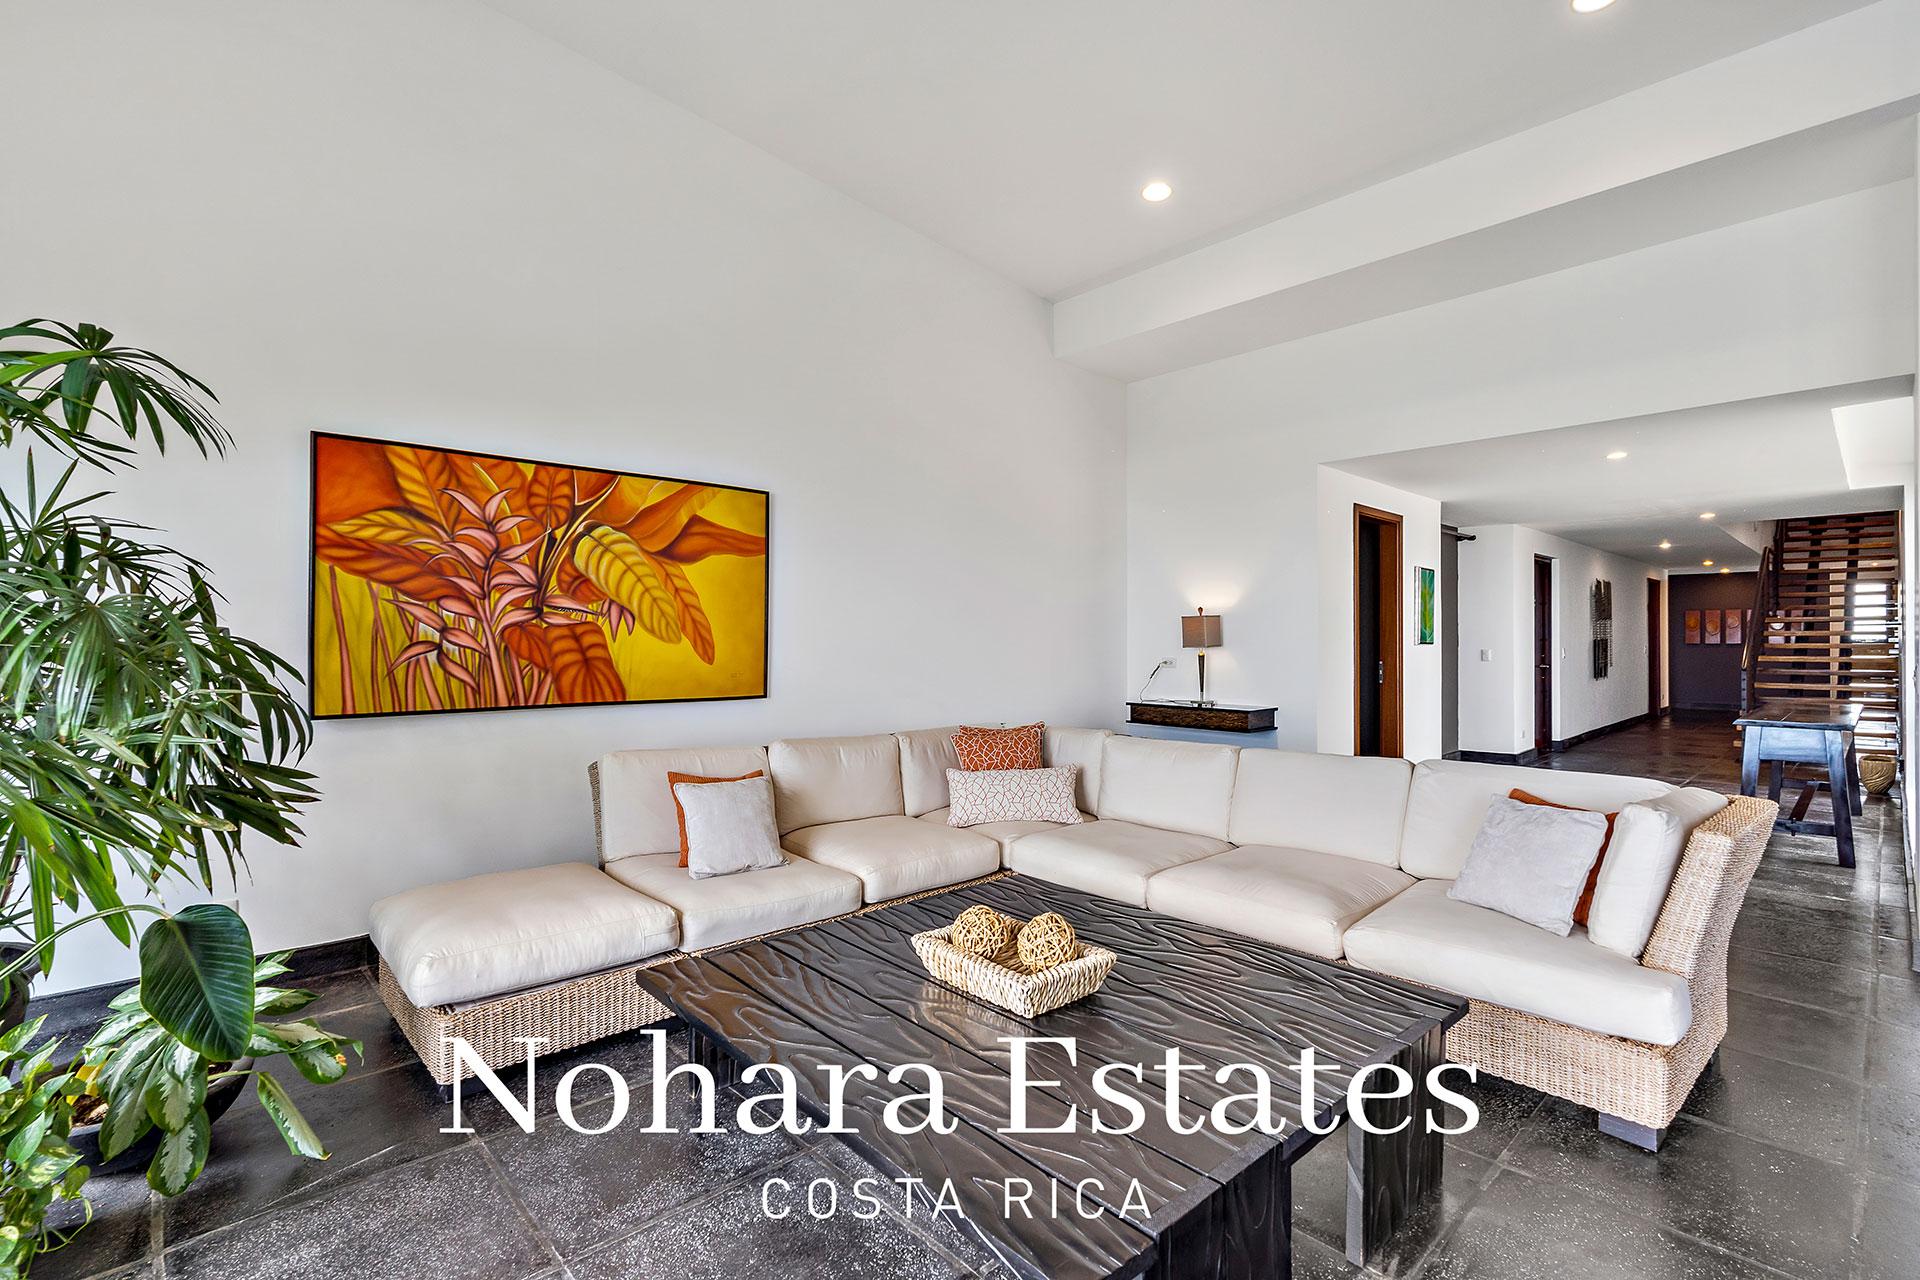 Nohara Estates Costa Rica 125 Apartment Quepos Los Altos 15